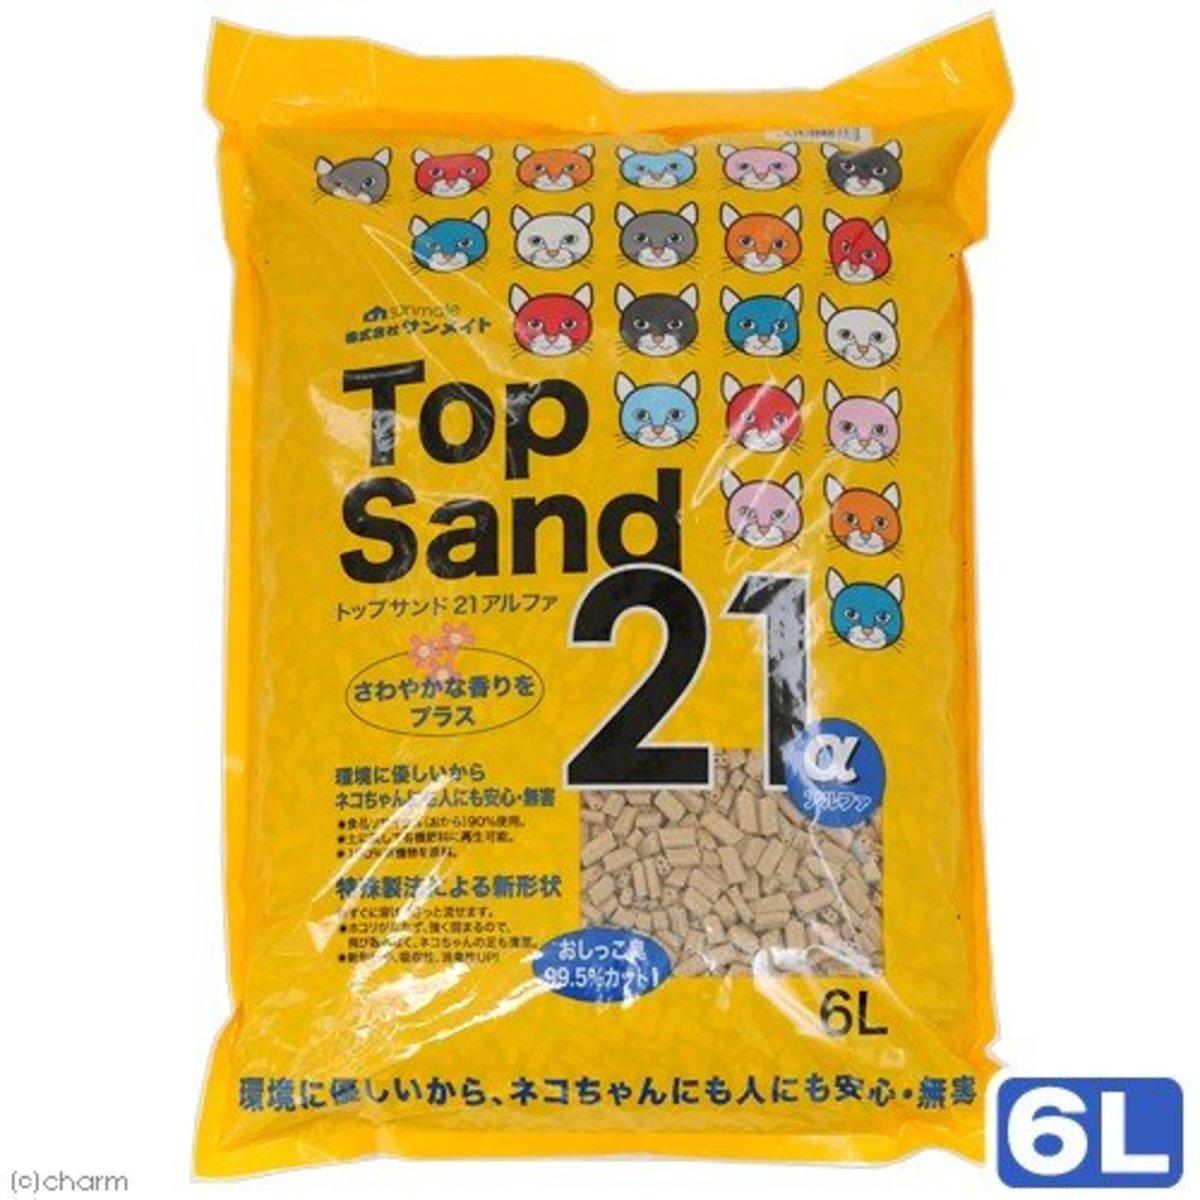 日本Top Sand 21 α 玉米雙通豆腐砂 6L